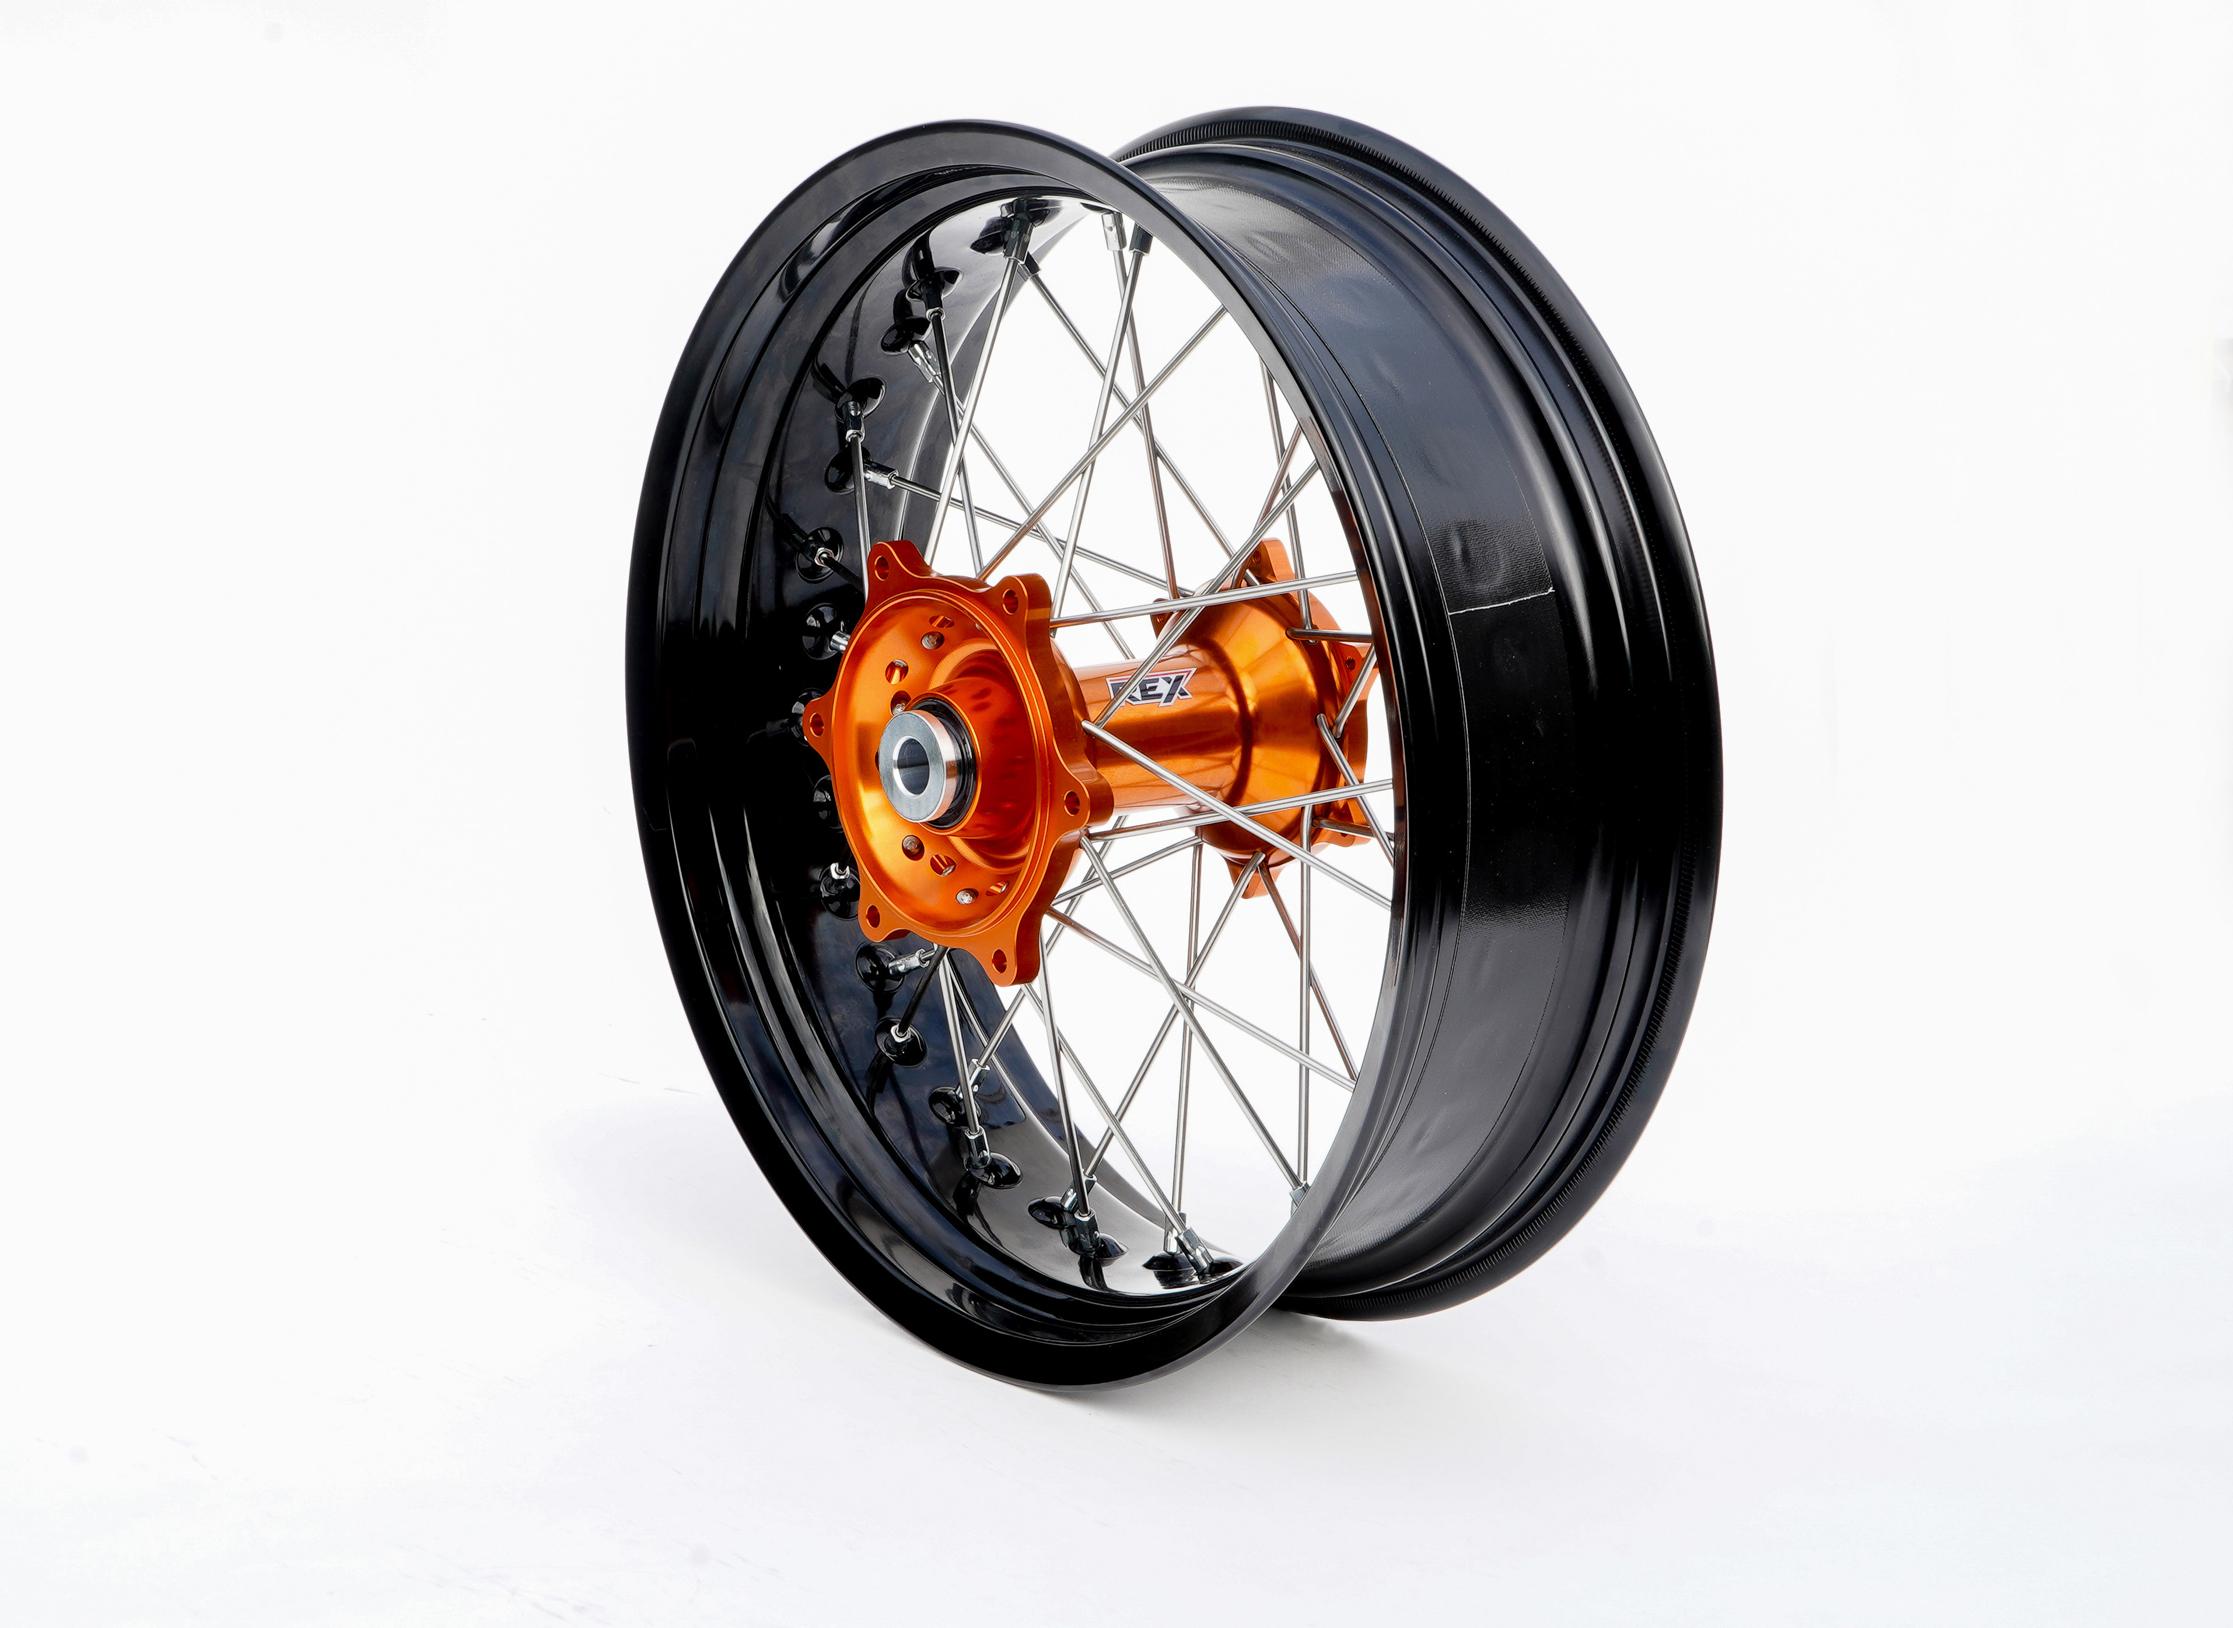 REX KTM モタードコンプリートリアホイール